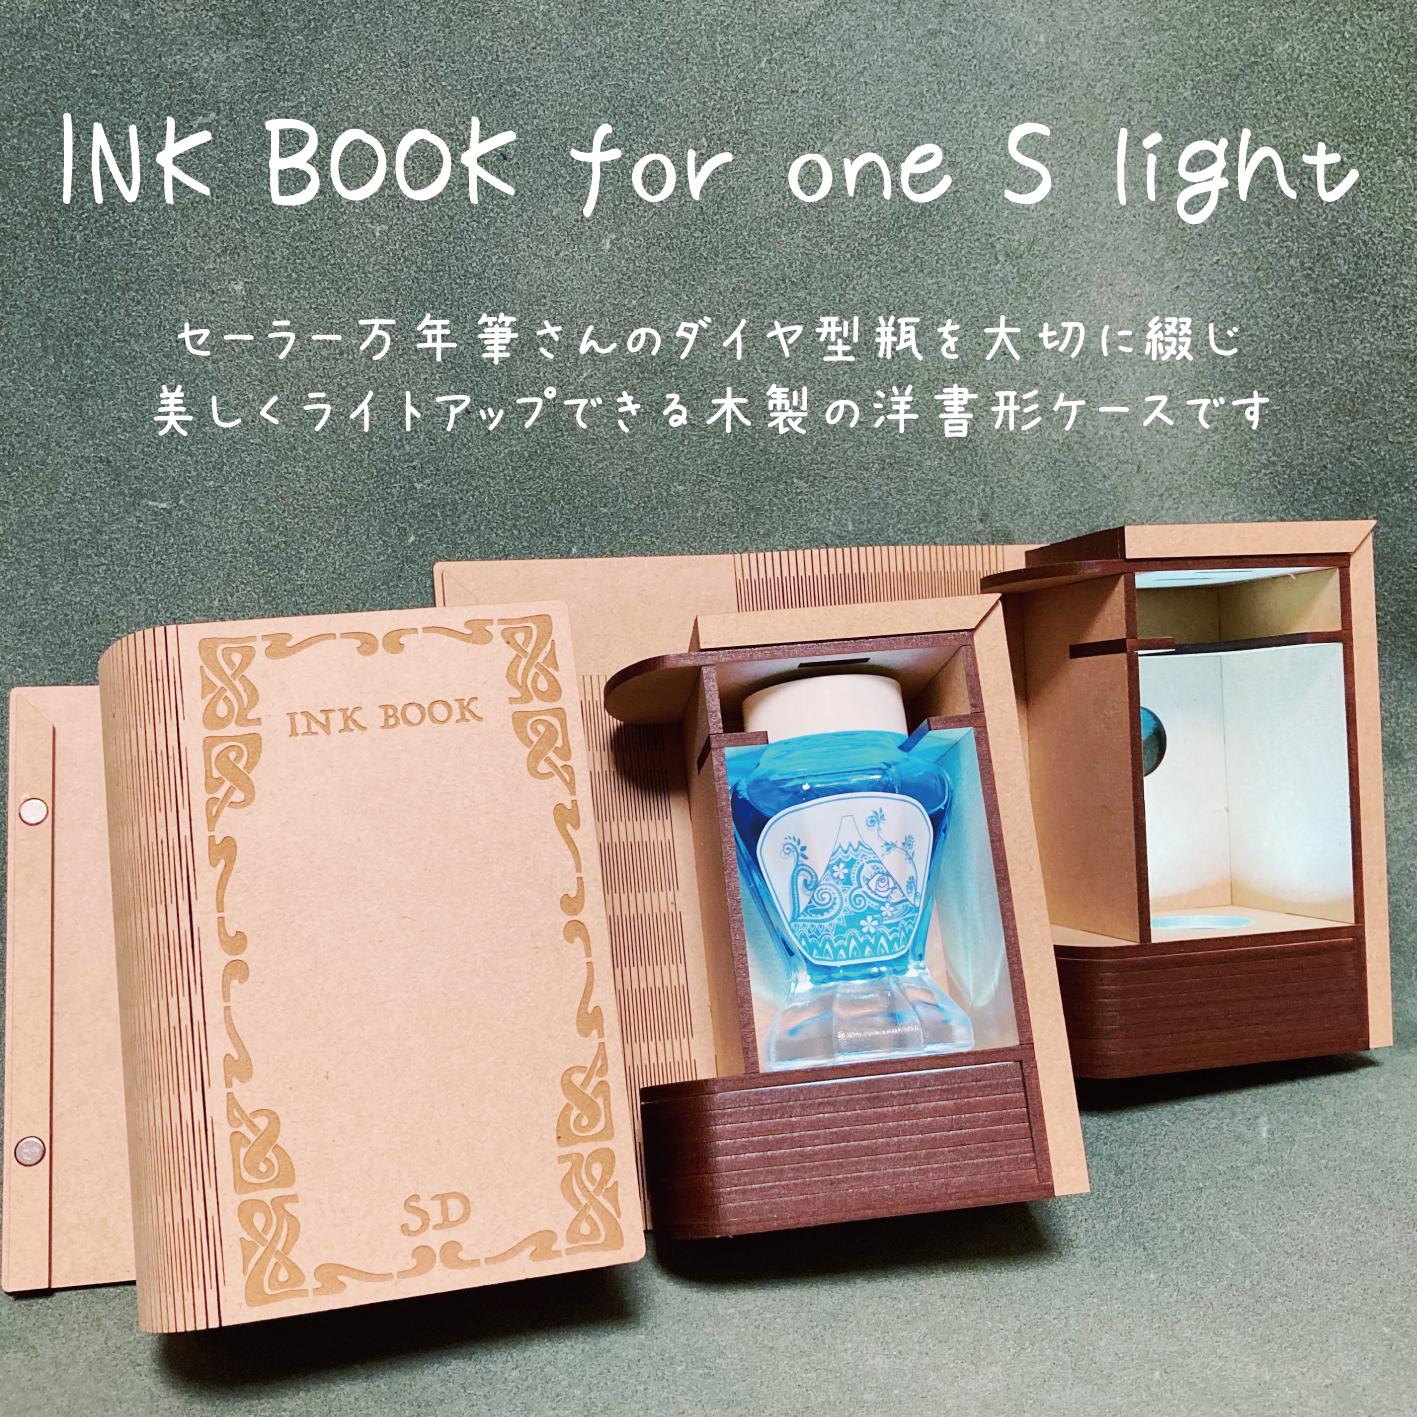 INK BOOK for one S light(セーラーダイヤ型ボトル対応)